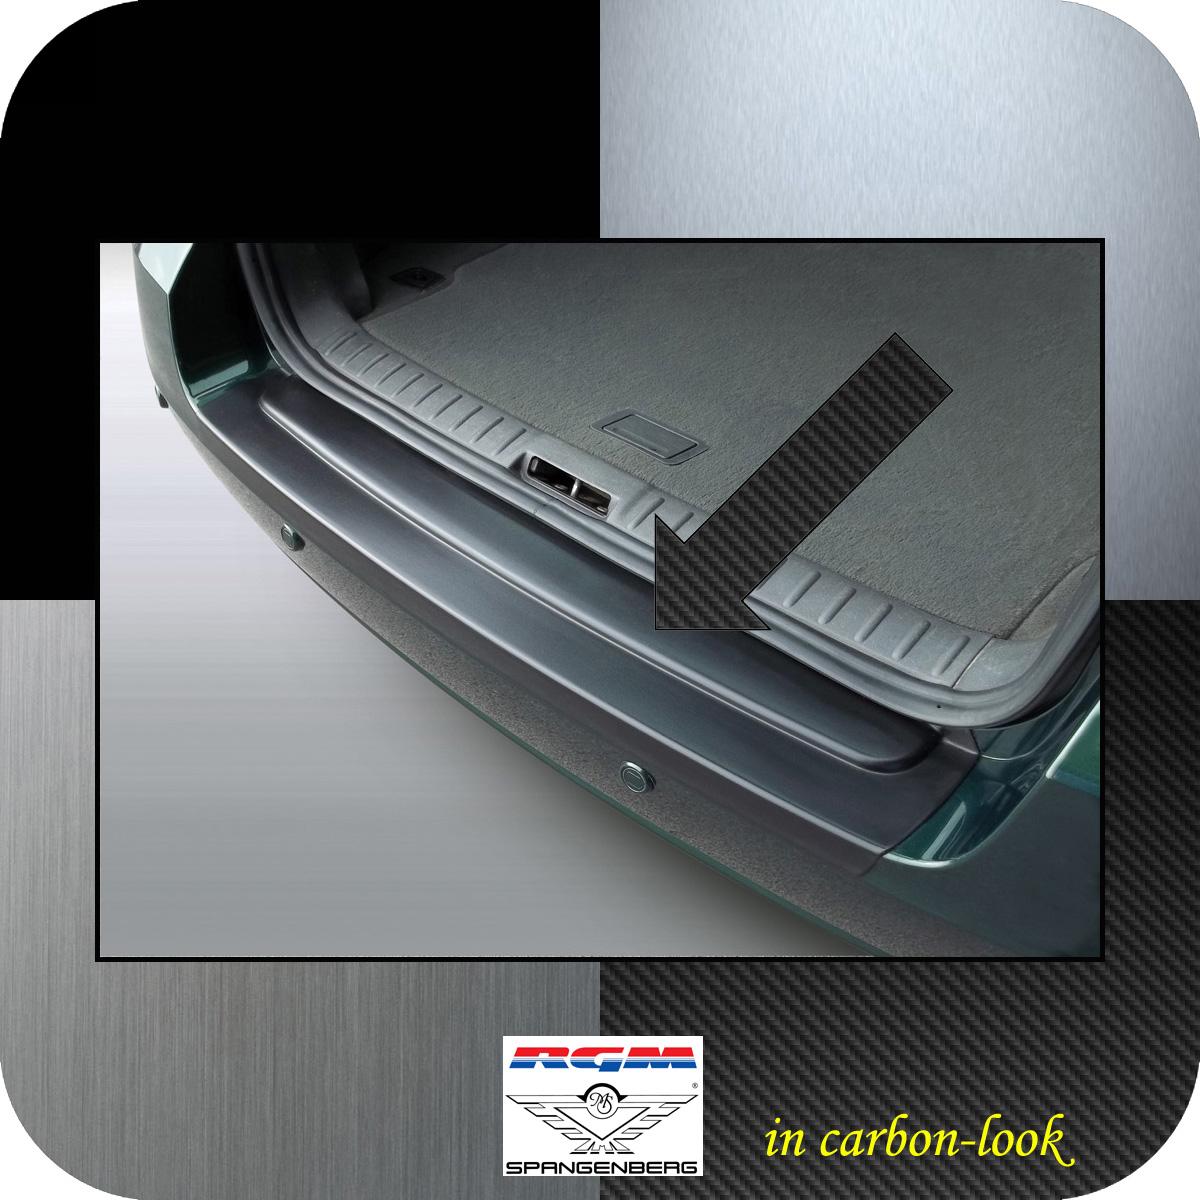 Ladekantenschutz Carbon-Look Rover 75 Tourer Kombi ab facelift 2004- 3509622